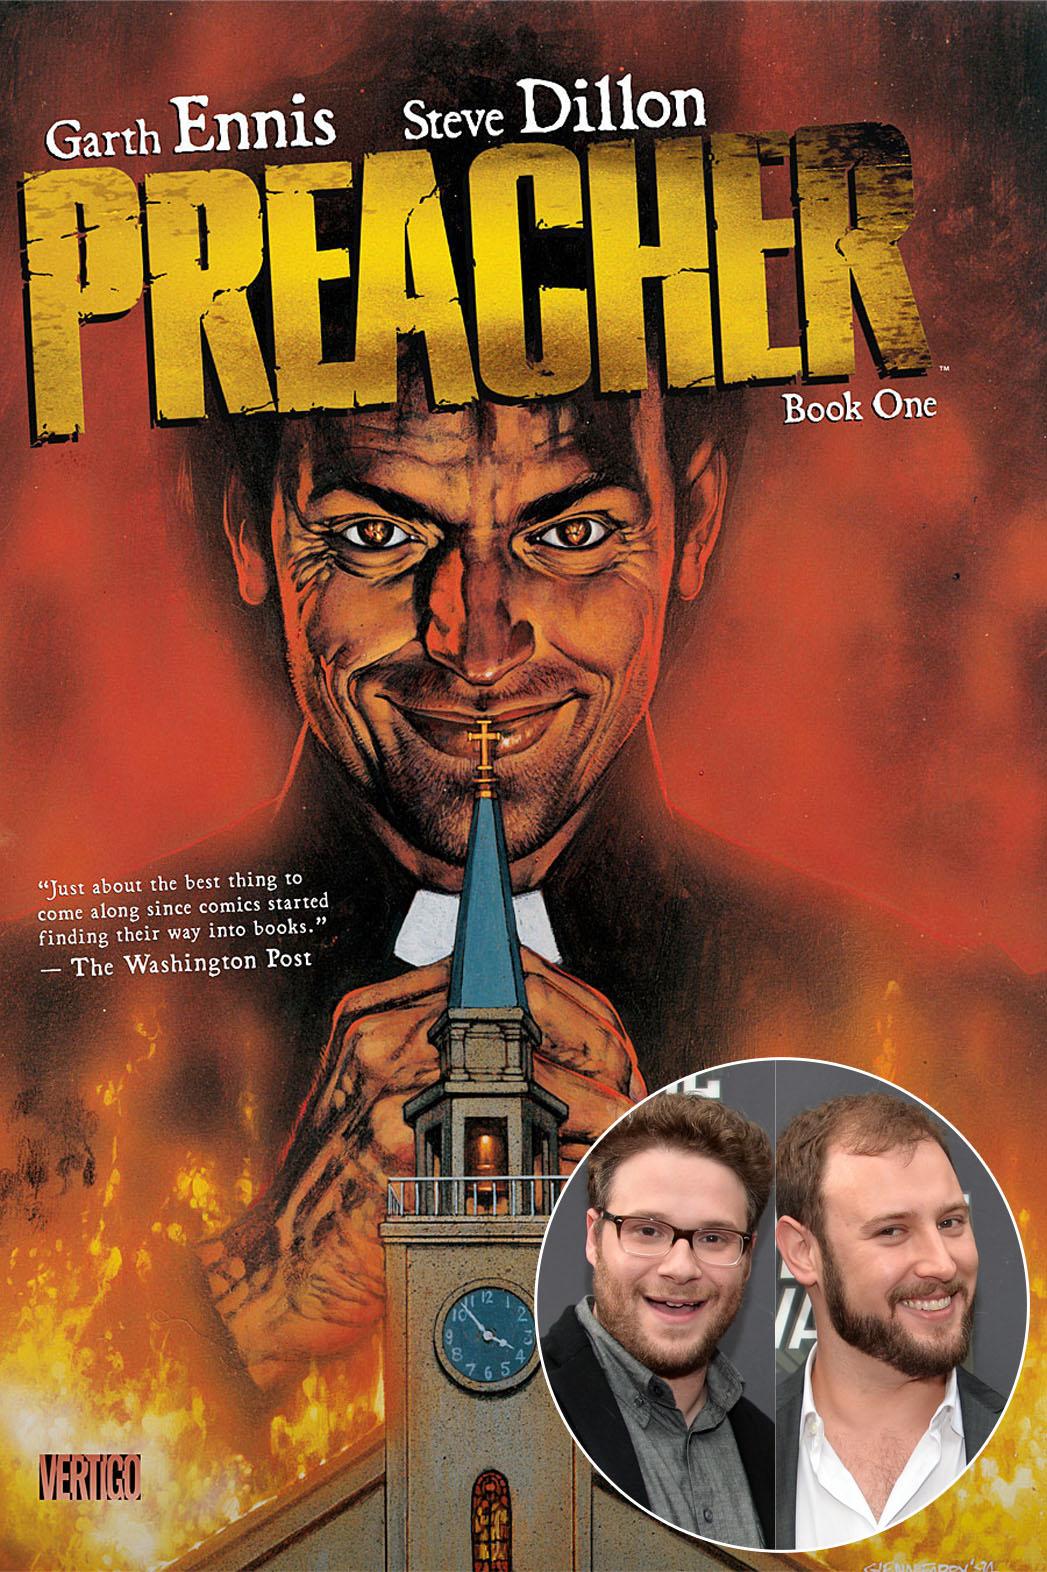 Preacher Cover Seth Rogen Evan Goldberg Inste - P 2013